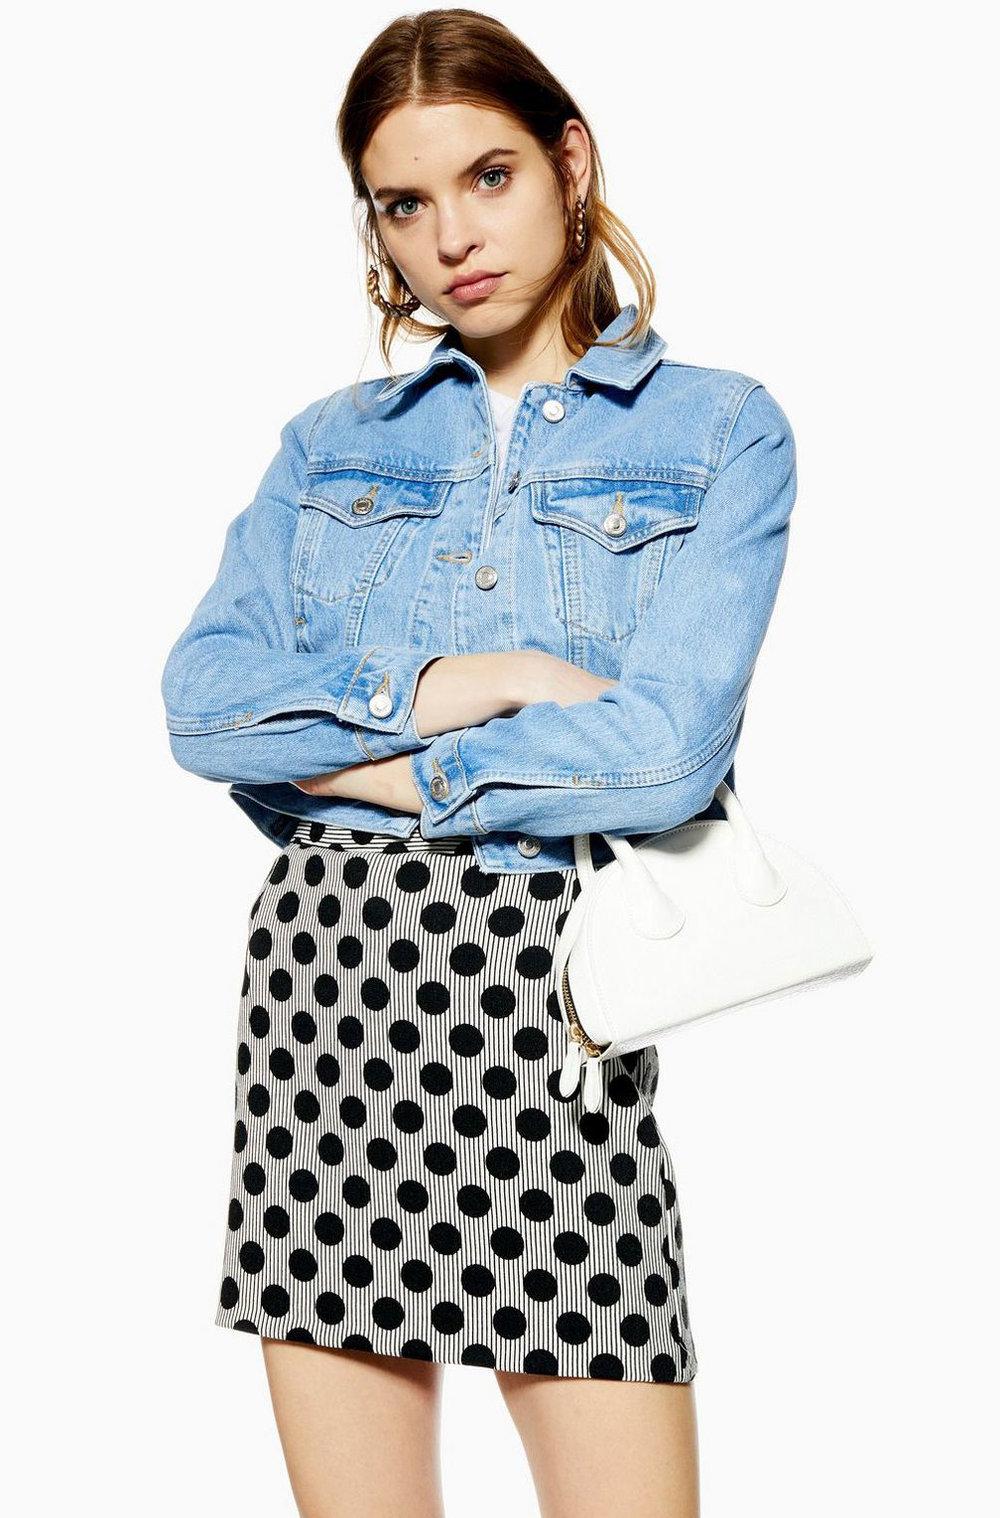 Top Shop Polka Dot Skirt  $60